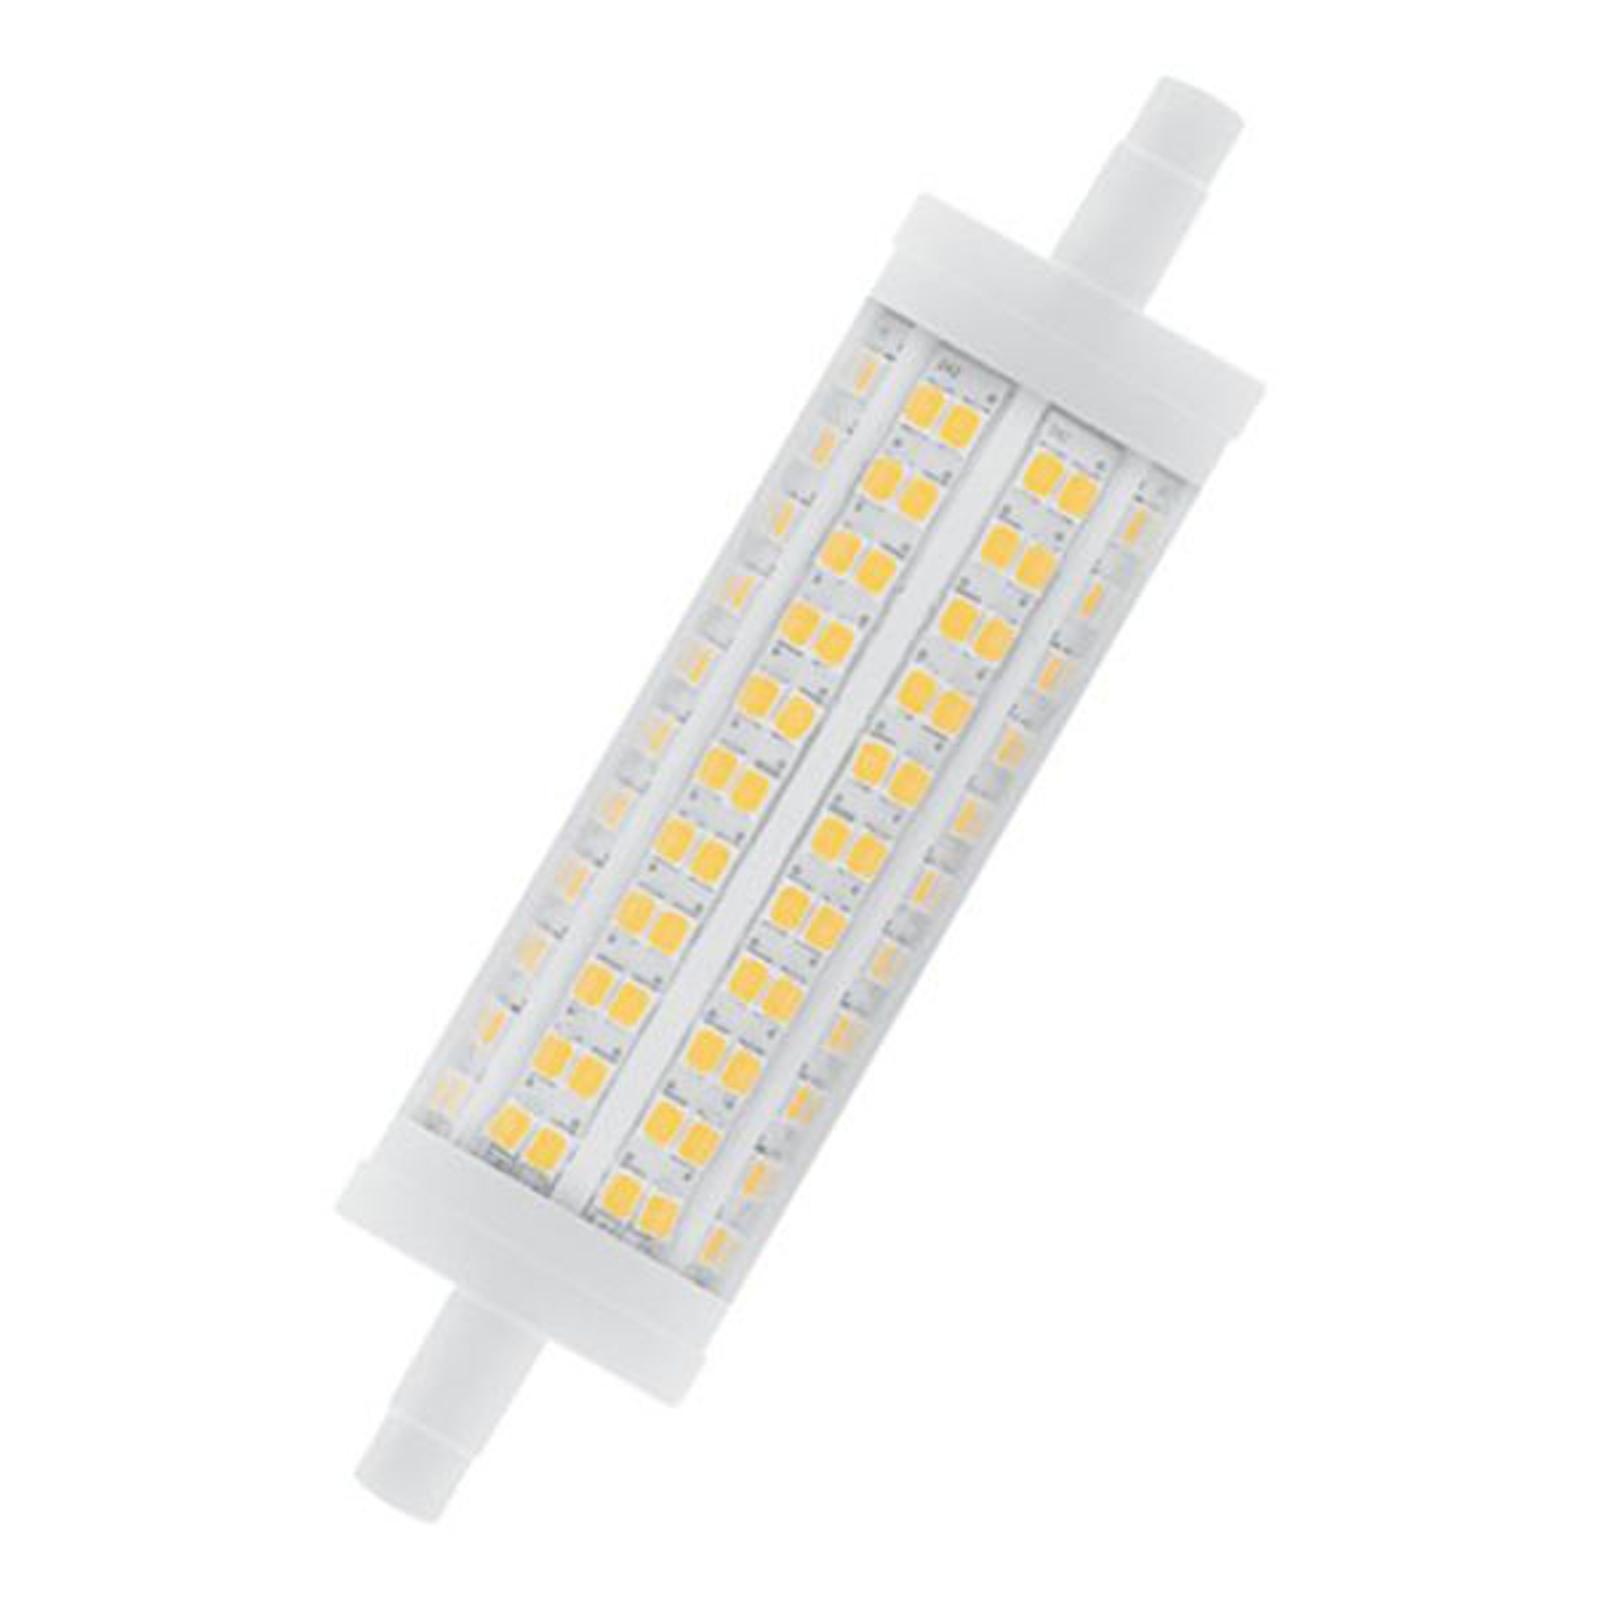 OSRAM LED-Lampe R7s 17,5W 2.700K dimmbar